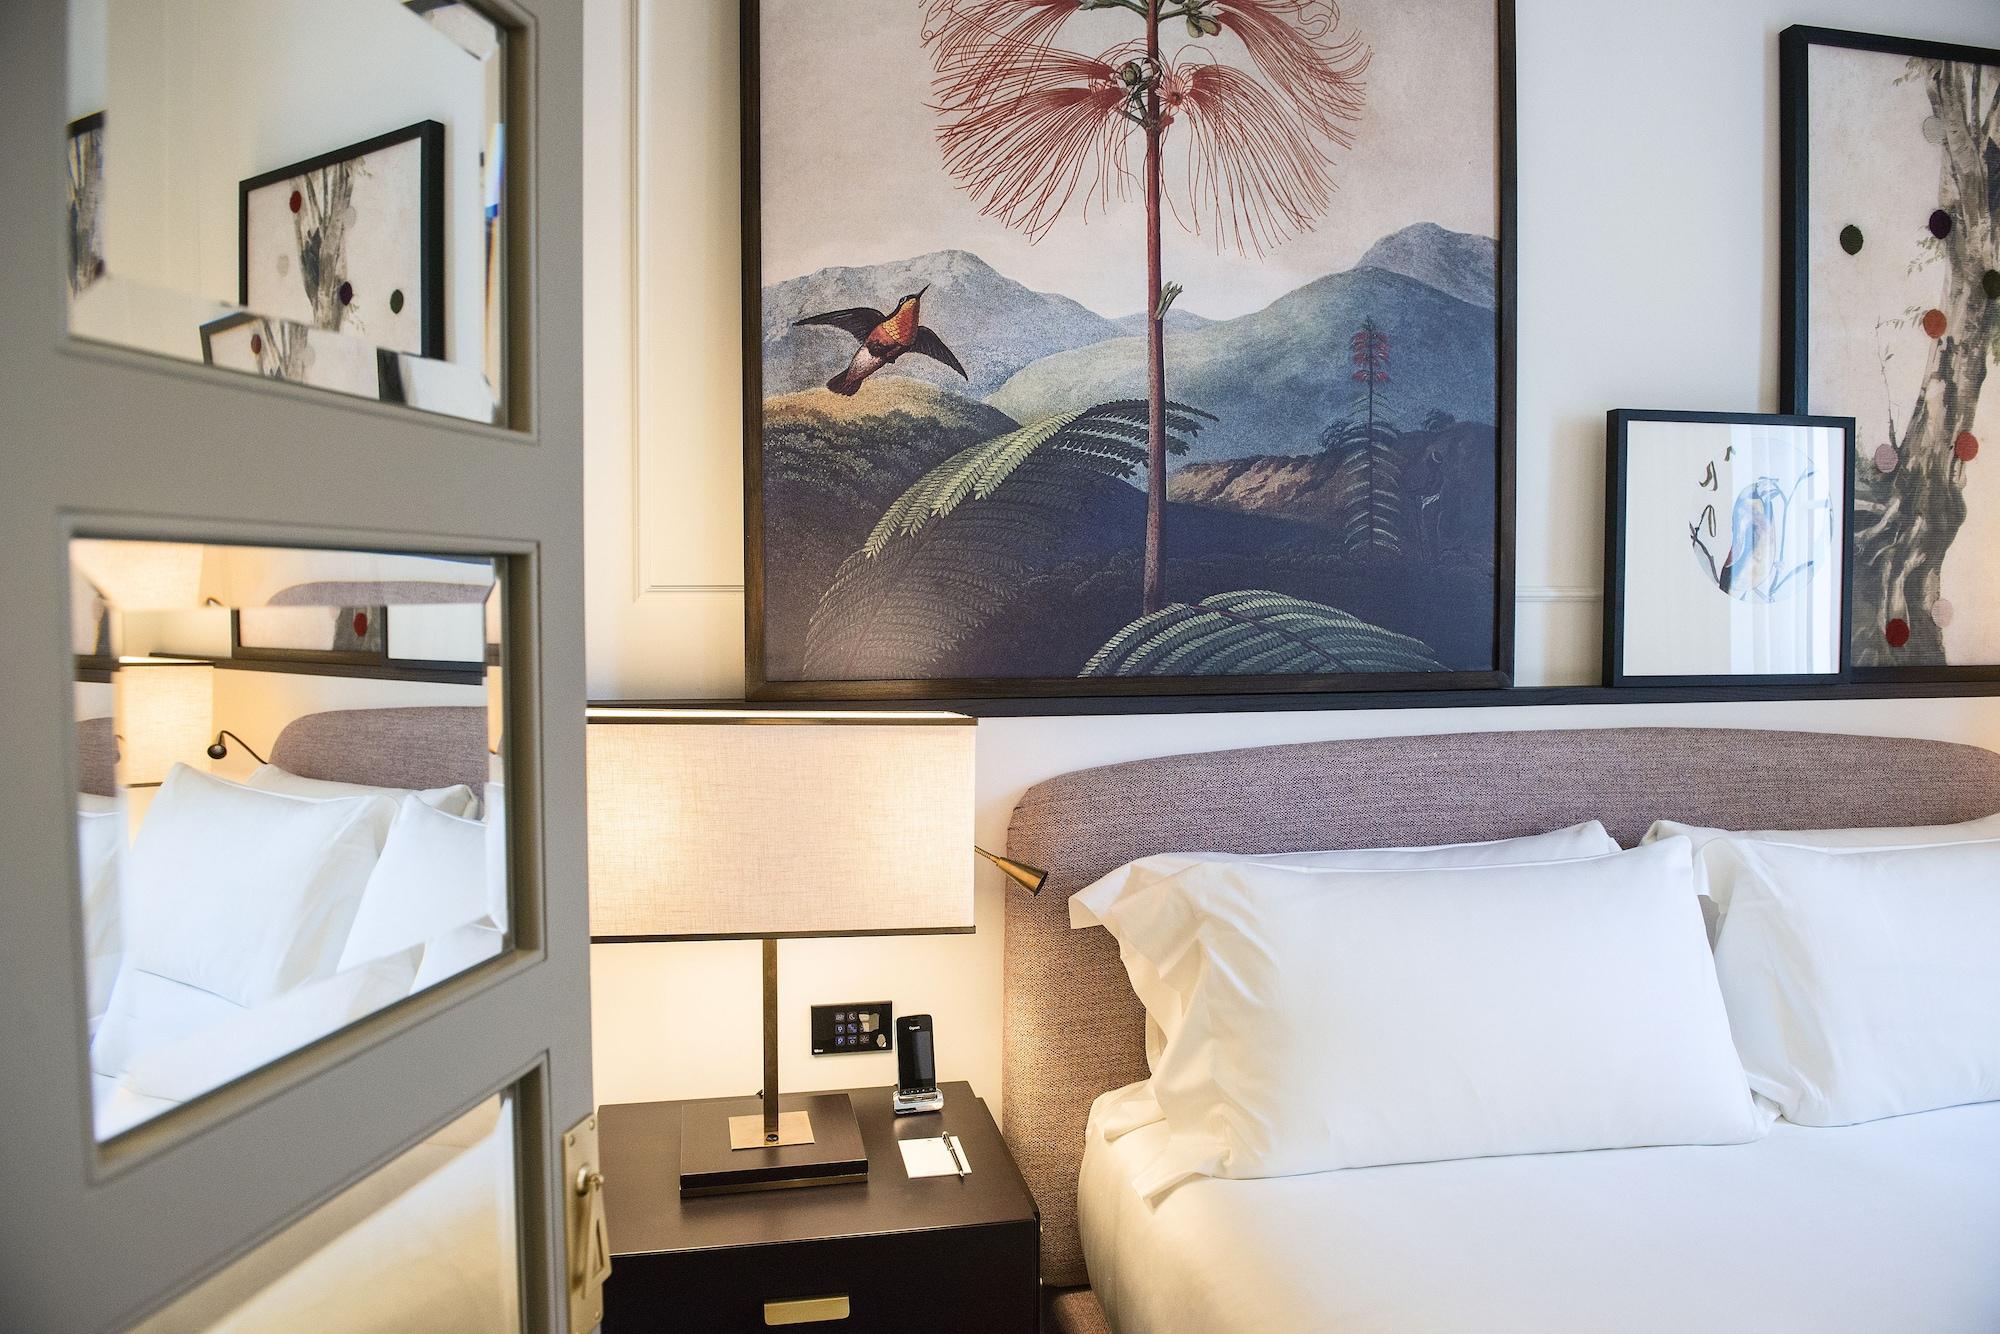 Vilon Charming Room